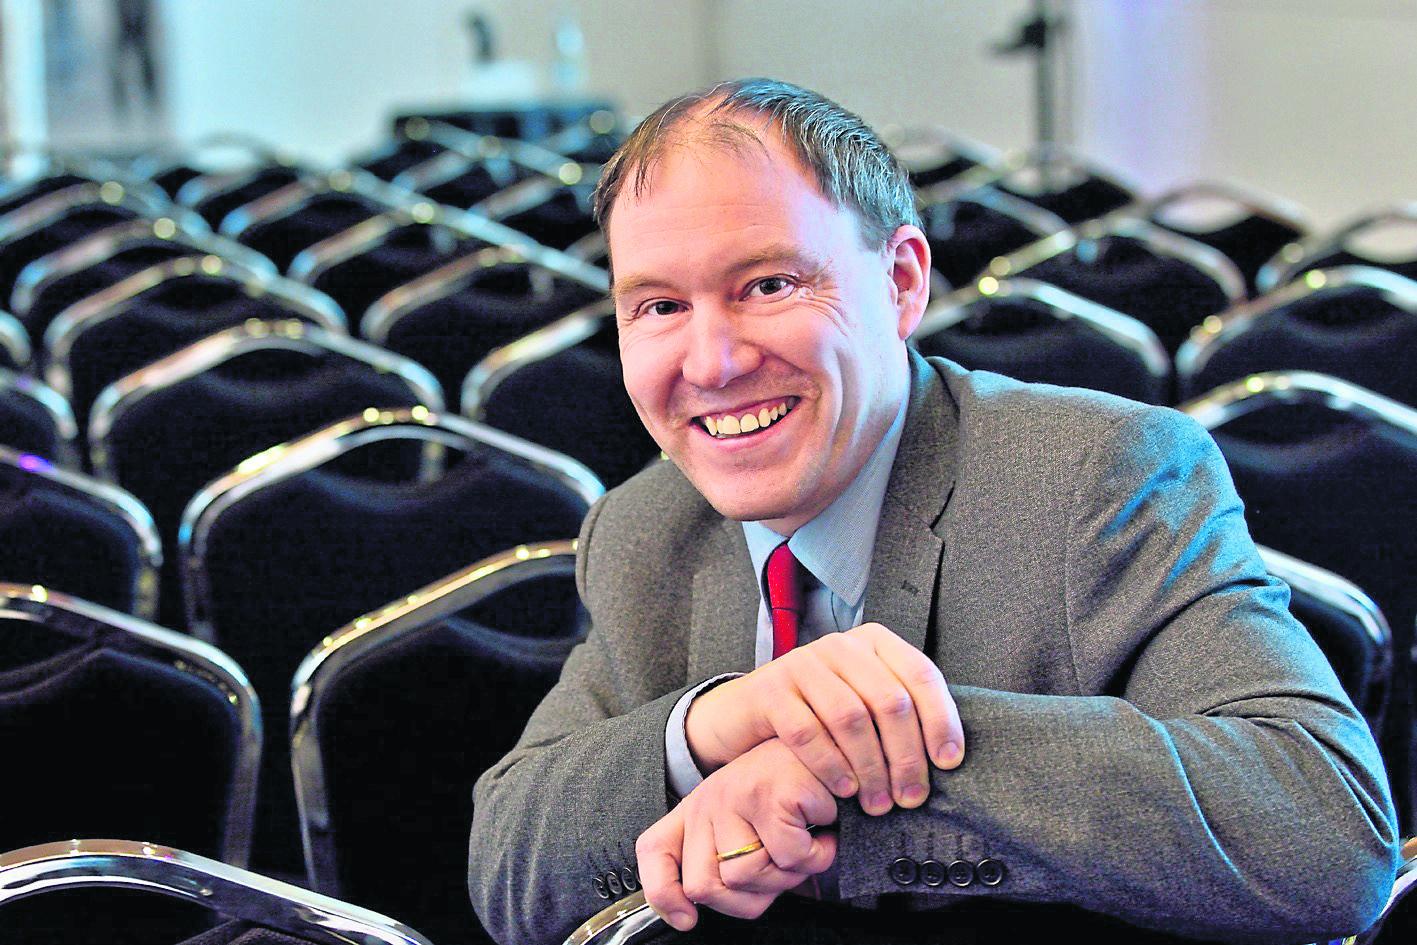 Scottish Property Federation director David Melhuish